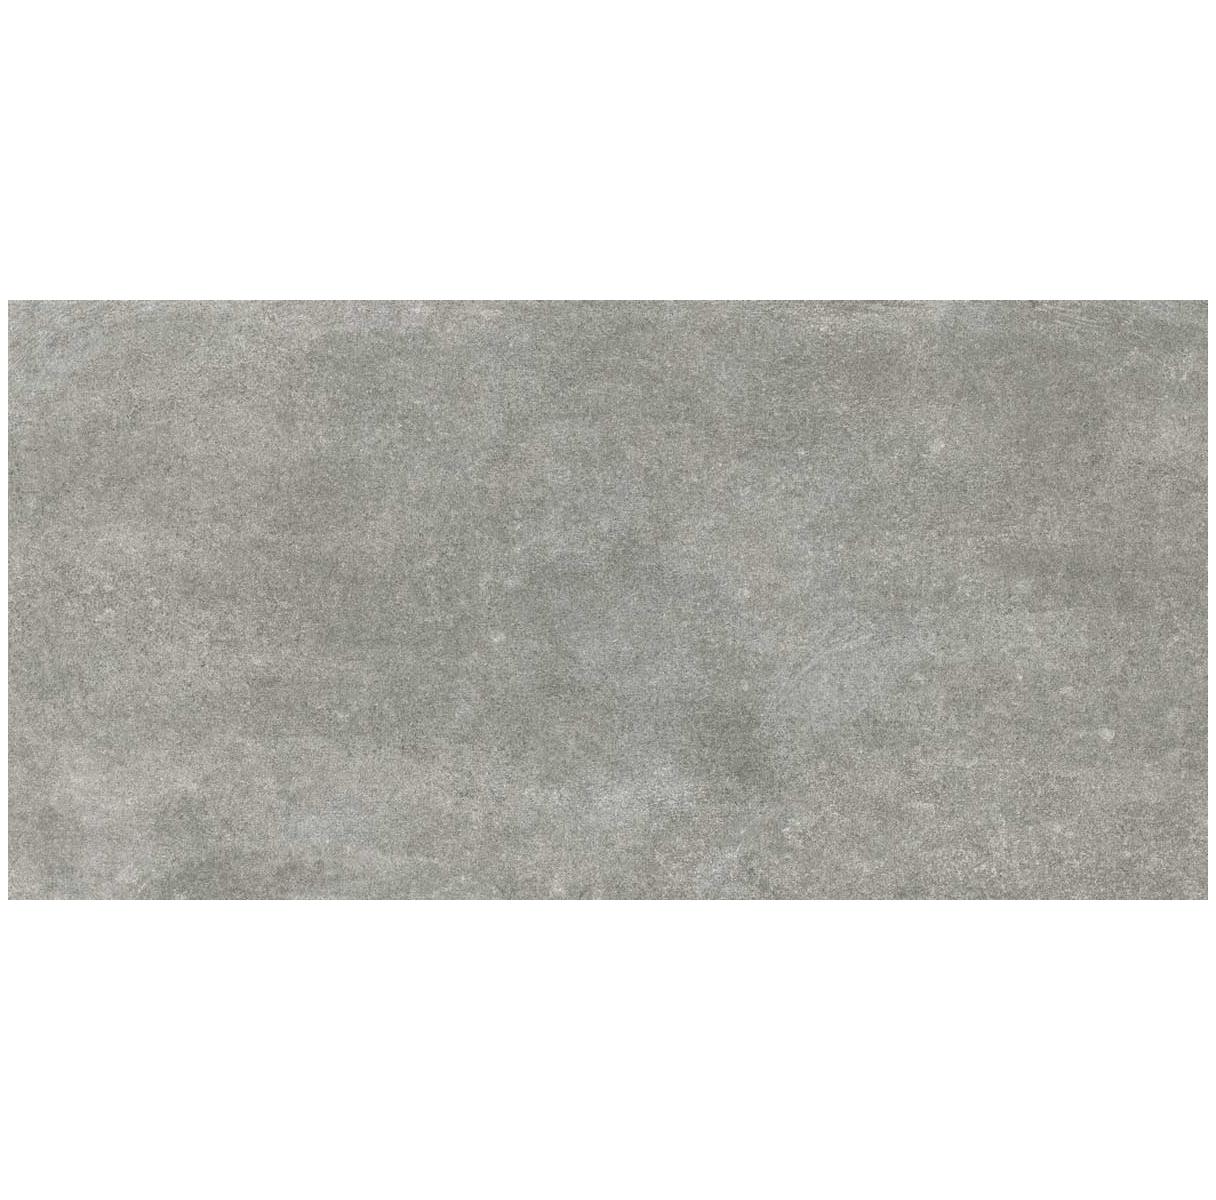 Floor tiles Modena WR-7680 60x120 cm 19107